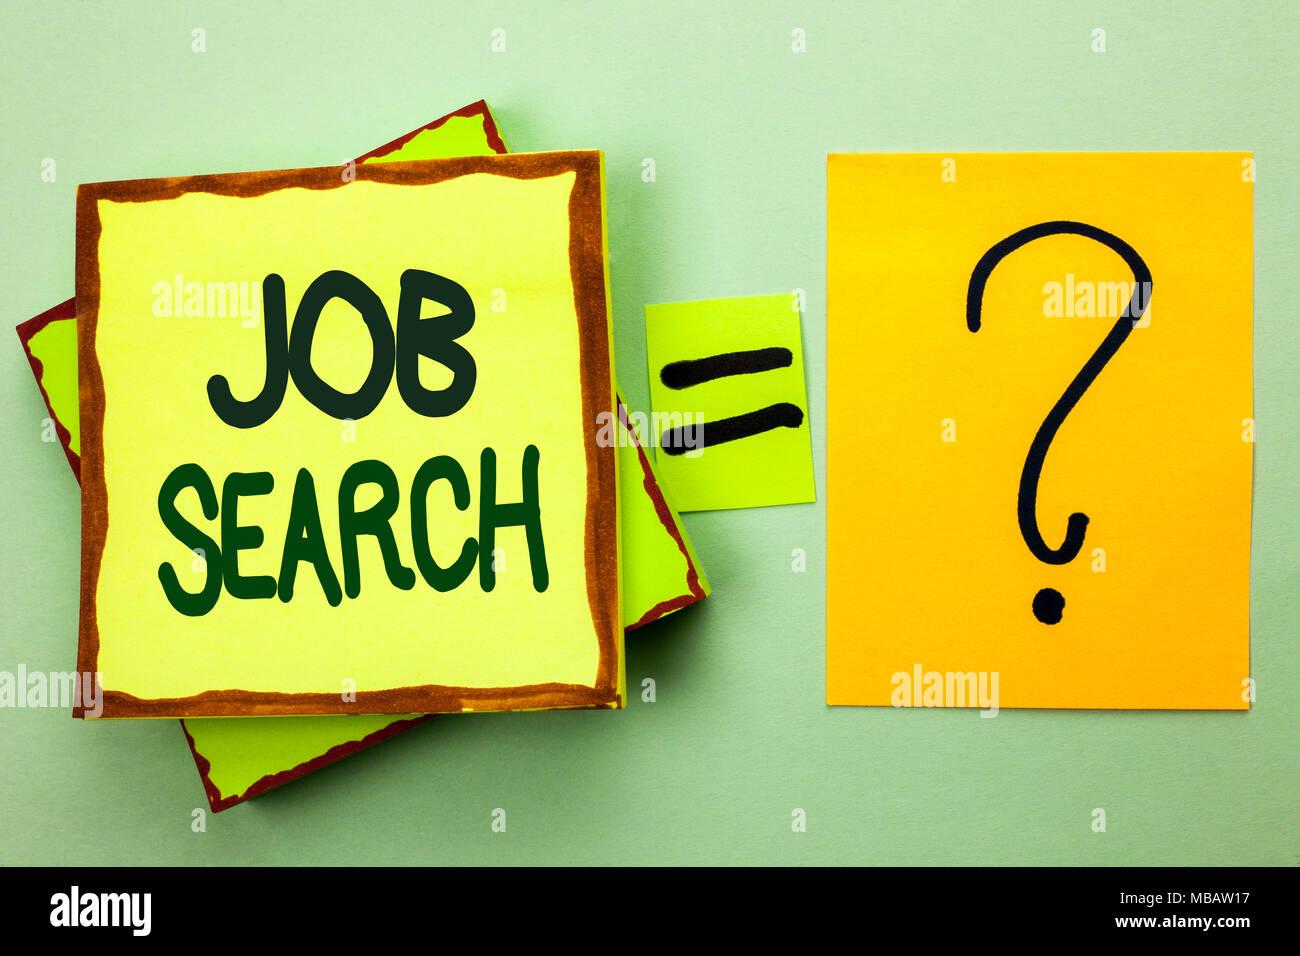 Recruitment Papers Imágenes De Stock & Recruitment Papers Fotos De ...